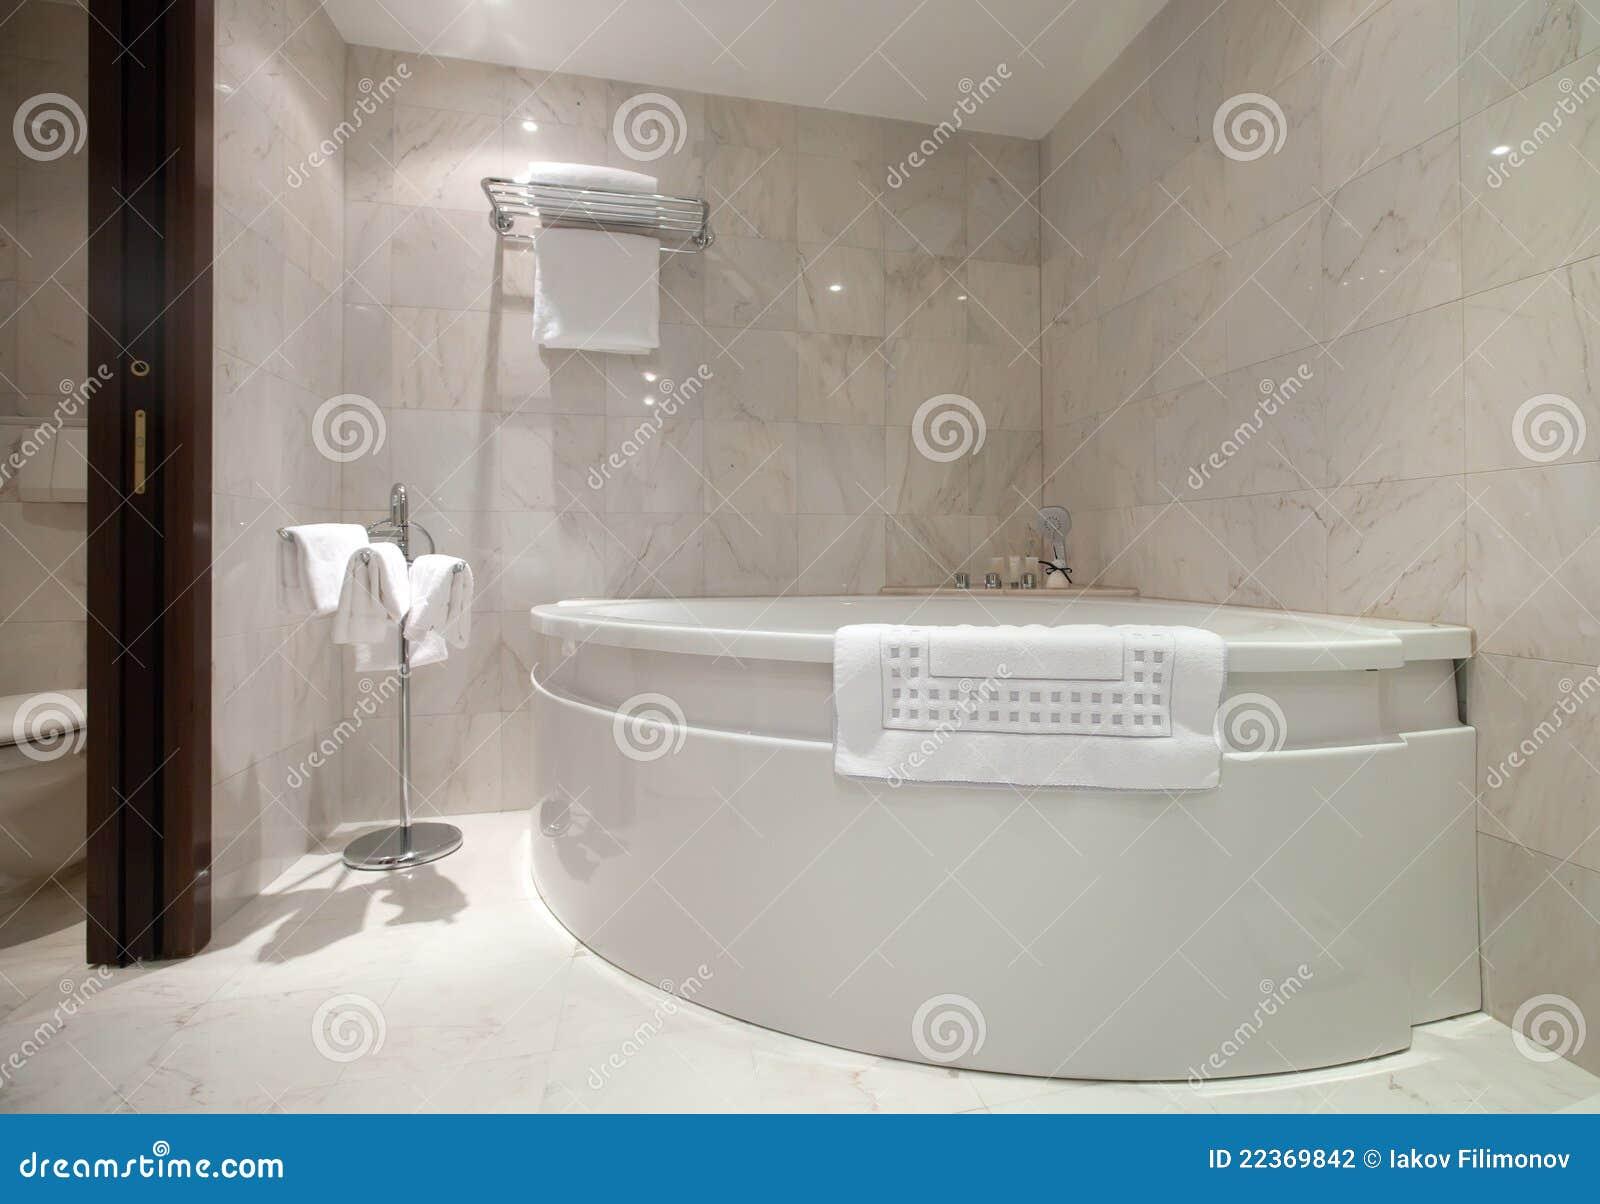 Bathroom with corner bathtub stock photo image of luxury elegance 22369842 - Image of bath room ...